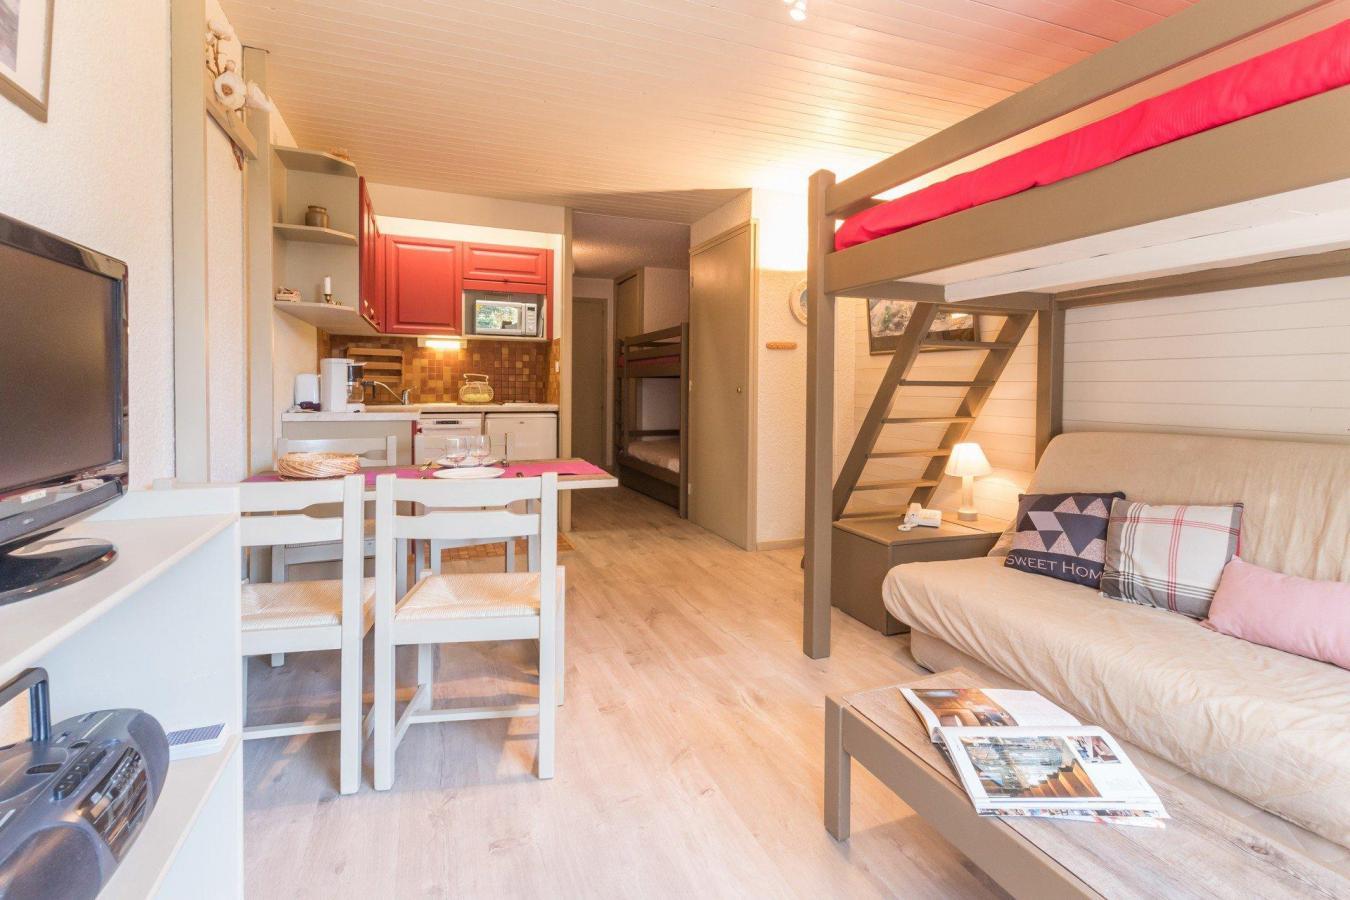 Location au ski Studio coin montagne 4 personnes (108) - Residence L'izoard - Serre Chevalier